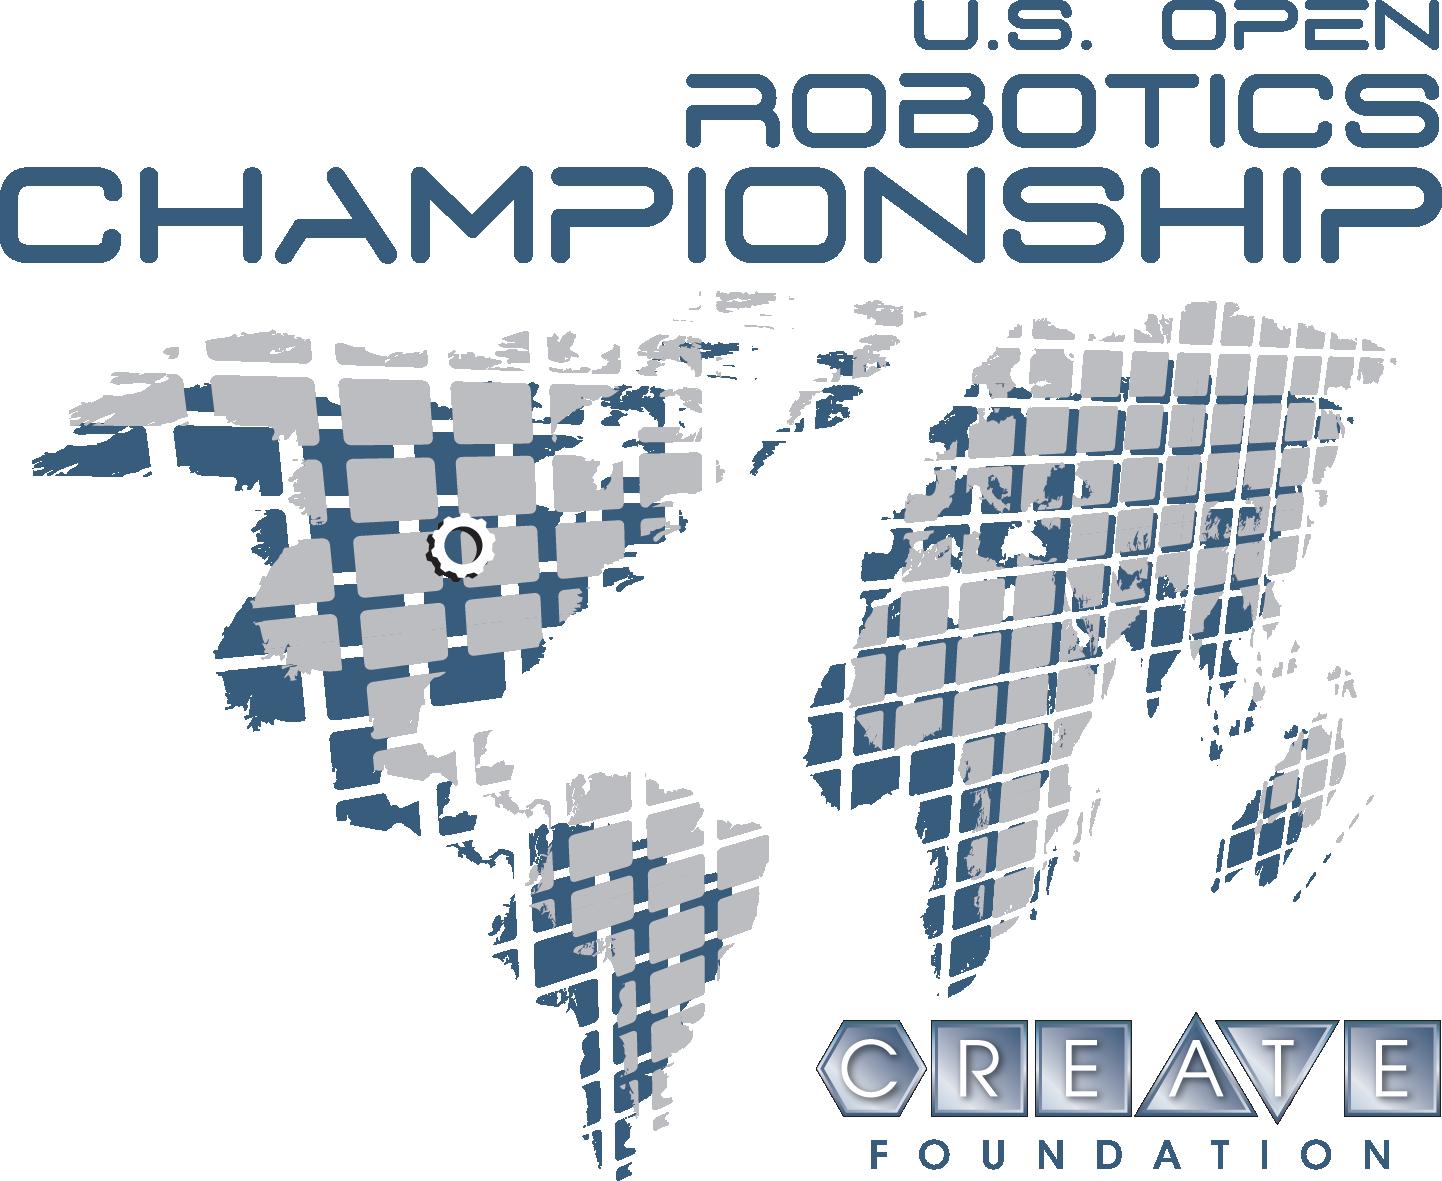 2020 CREATE U.S. Open Robotics Championship - VEX IQ - ELEMENTARY SCHOOL DIVISION